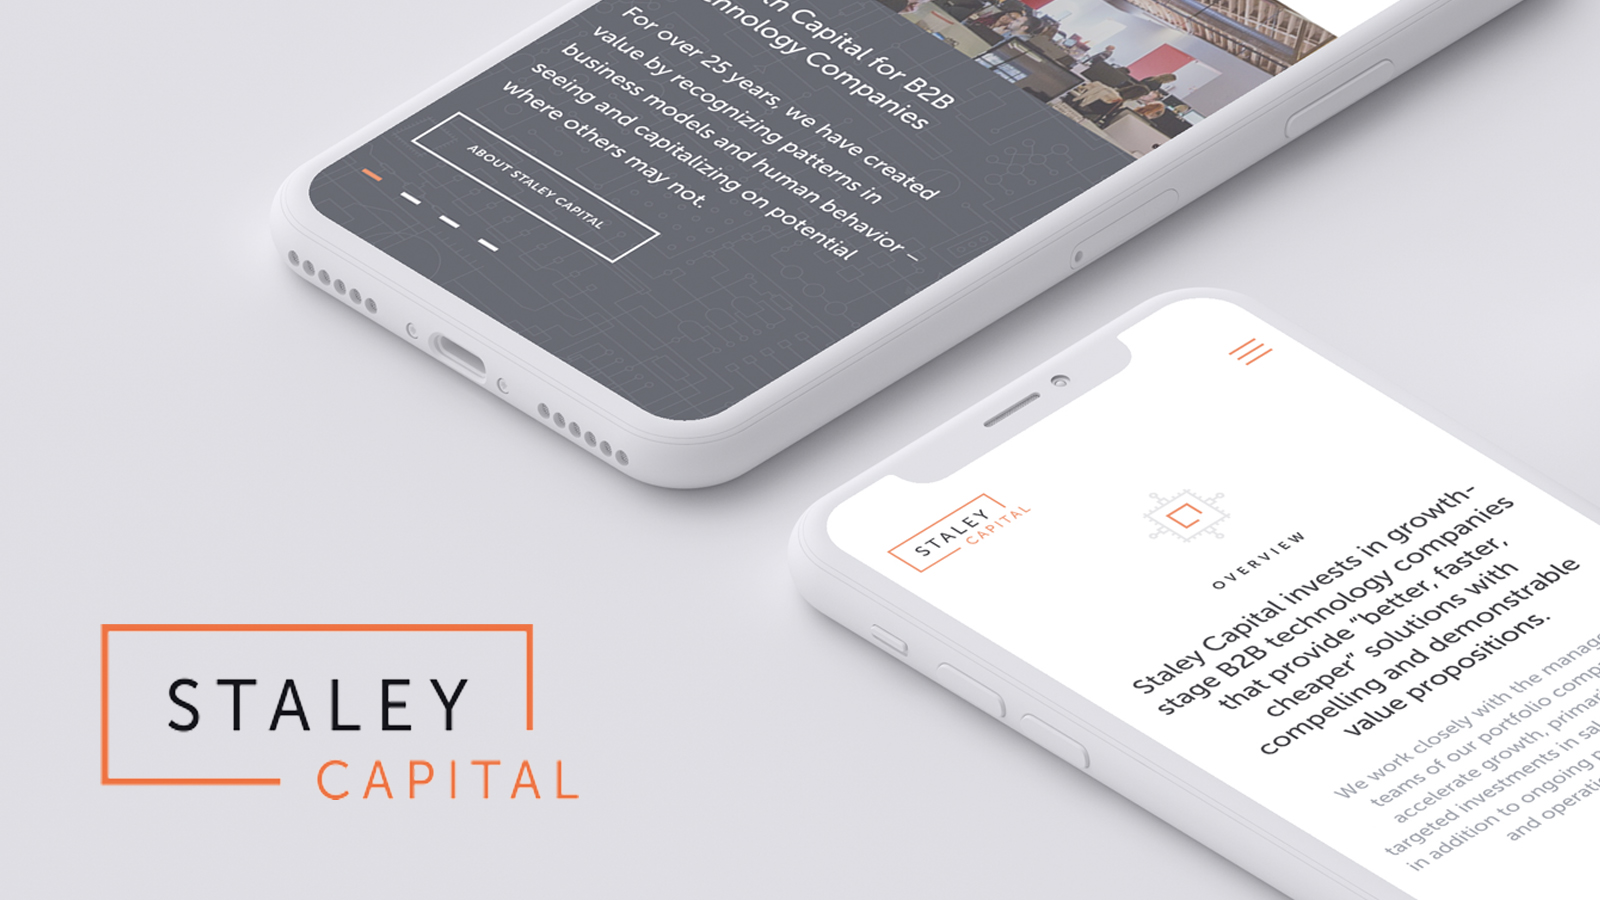 project-thumb-staley-capital.jpg